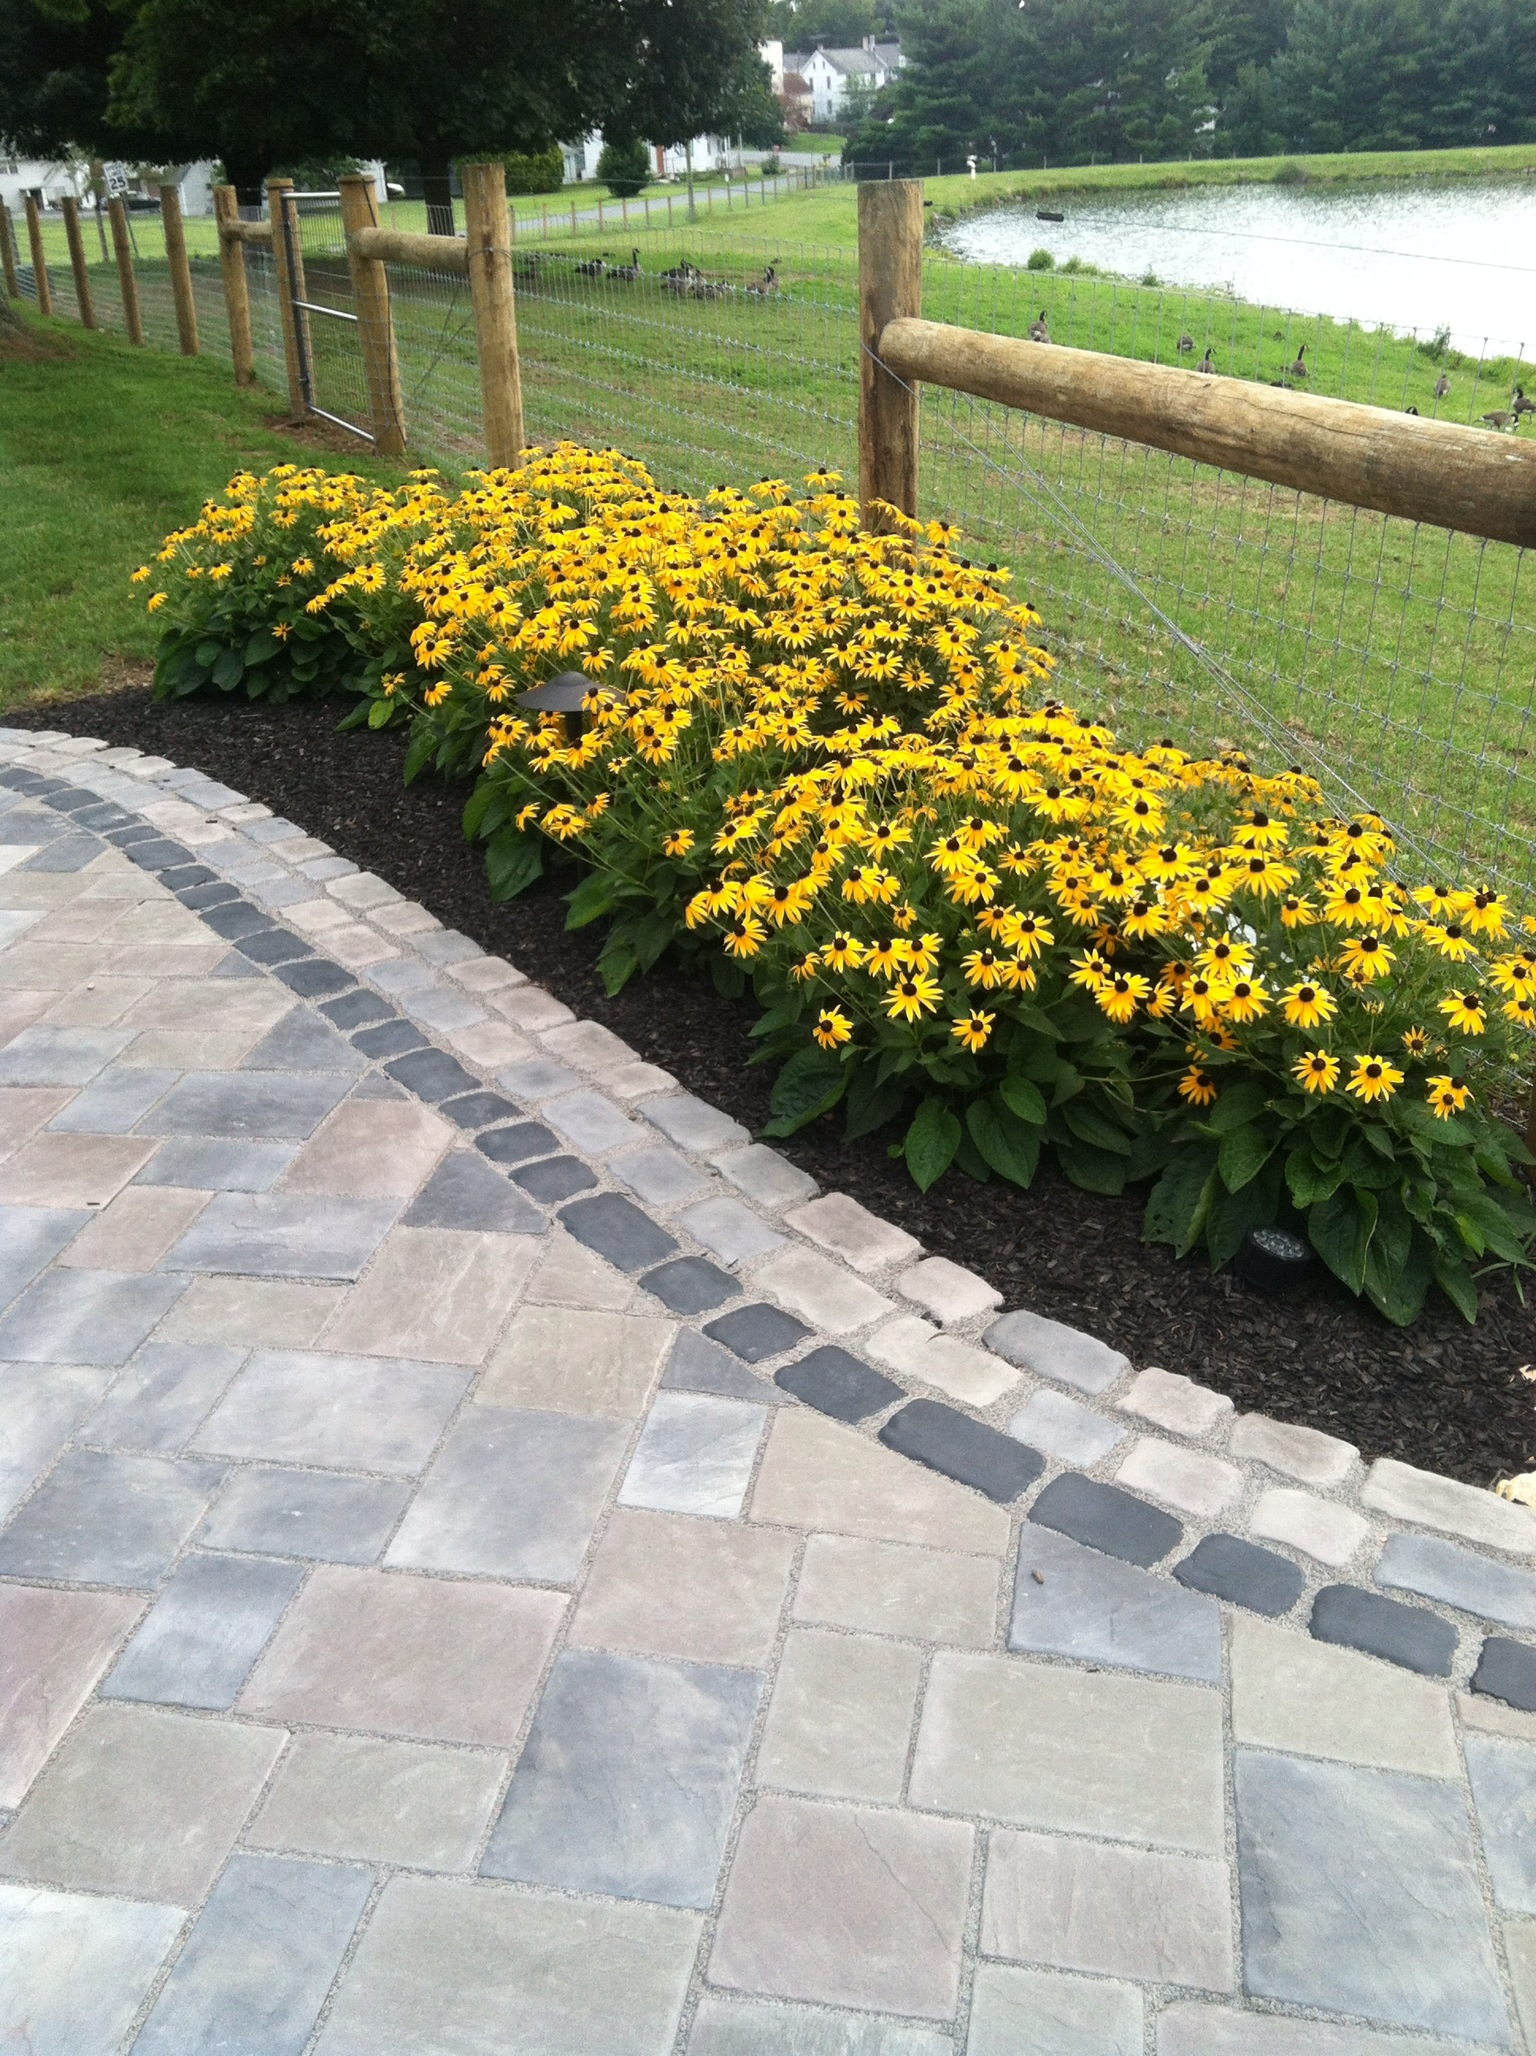 5 Landscape Maintenance Tips for Your Pottsville, PA, Home